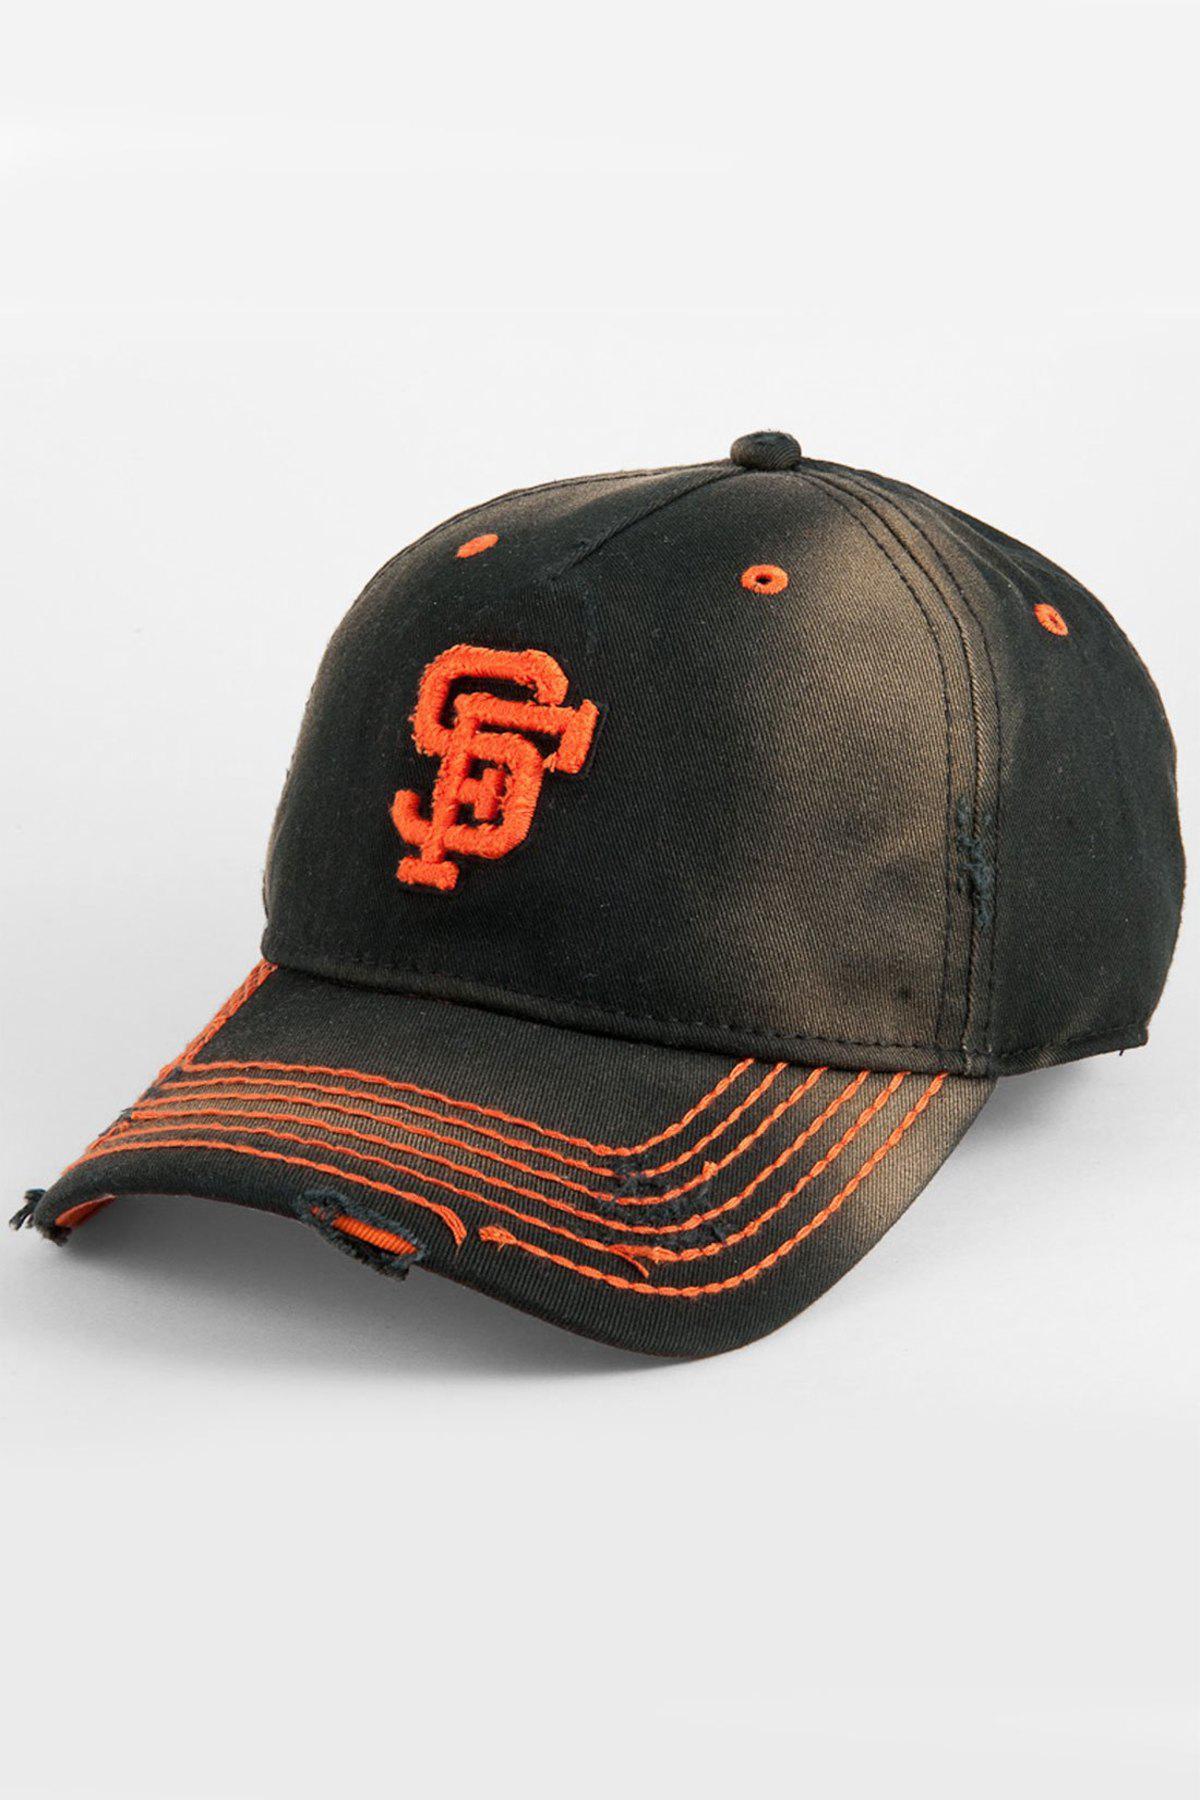 77ad50a479b Lyst - American Needle San Francisco Giants Baseball Cap in Black ...